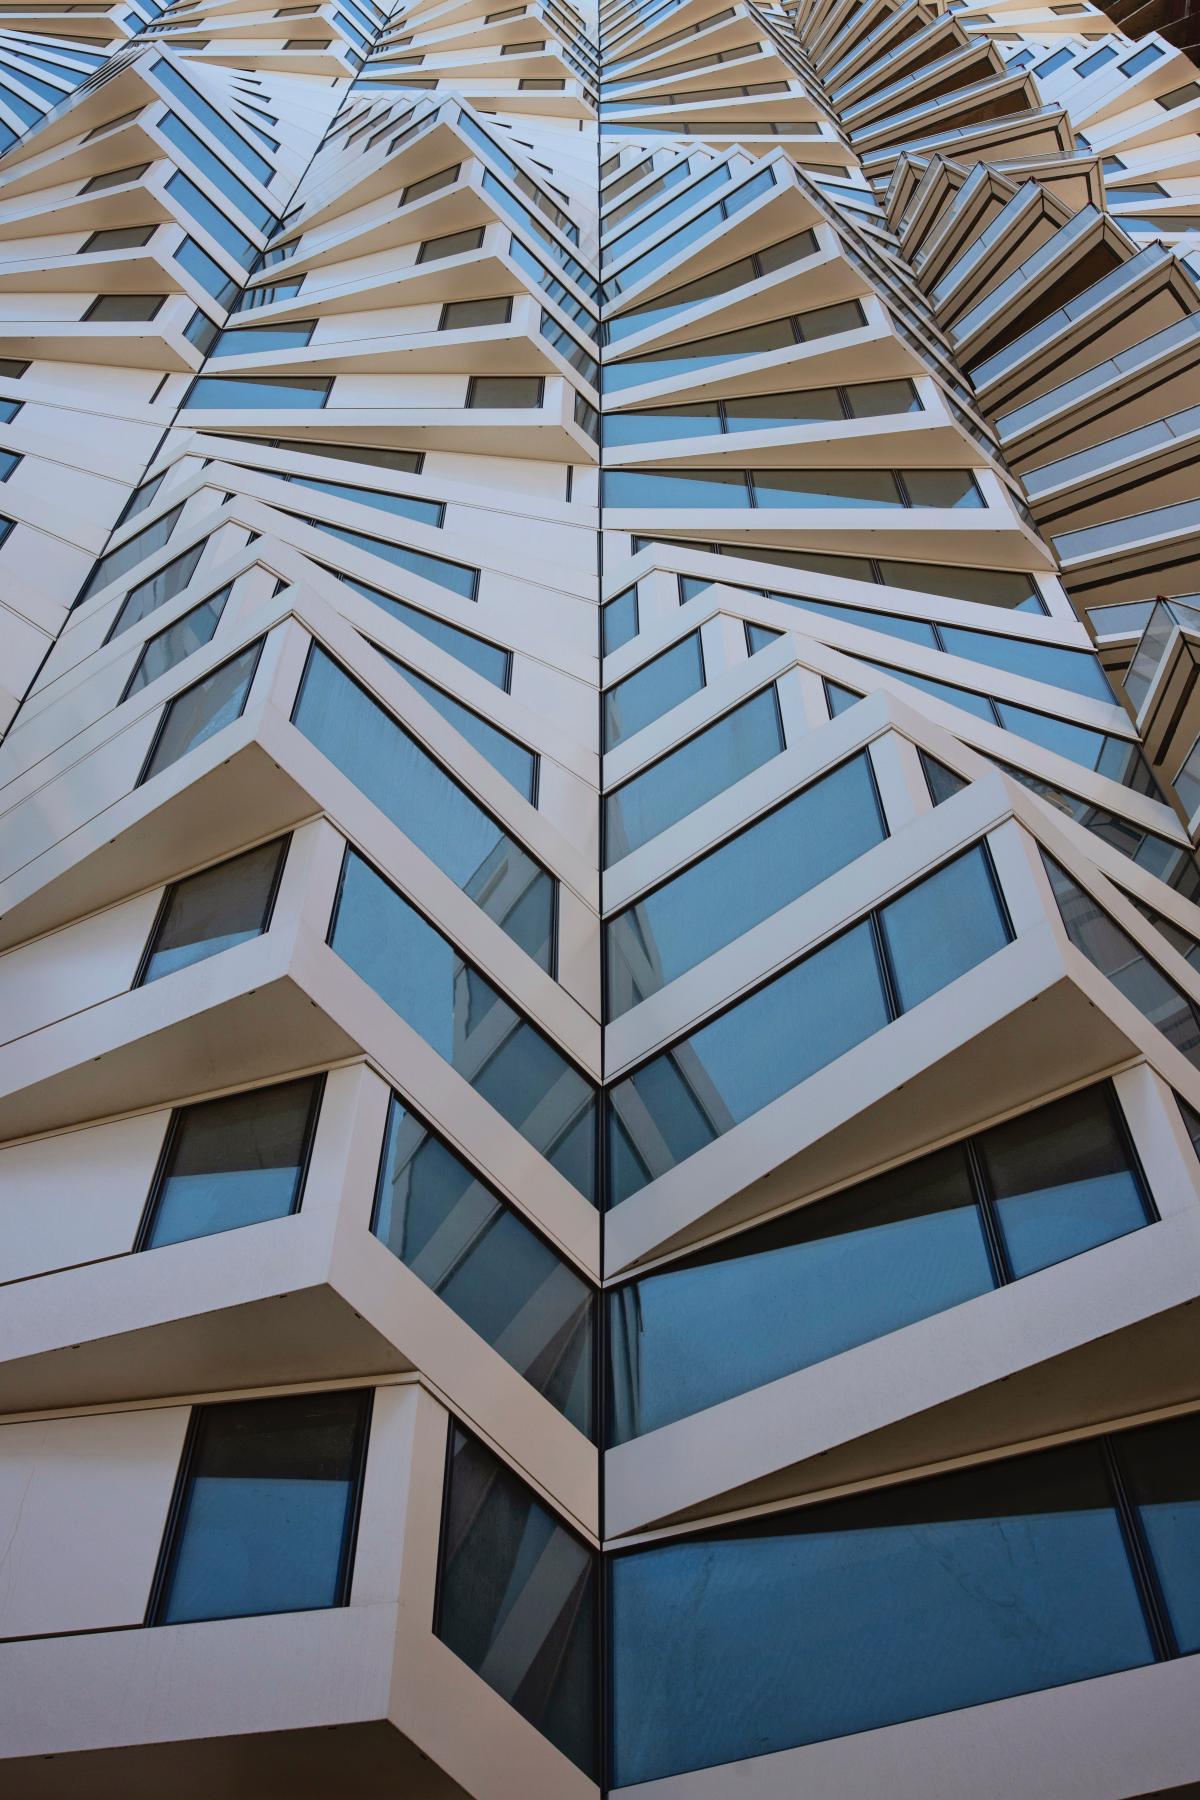 Architecture Window Building